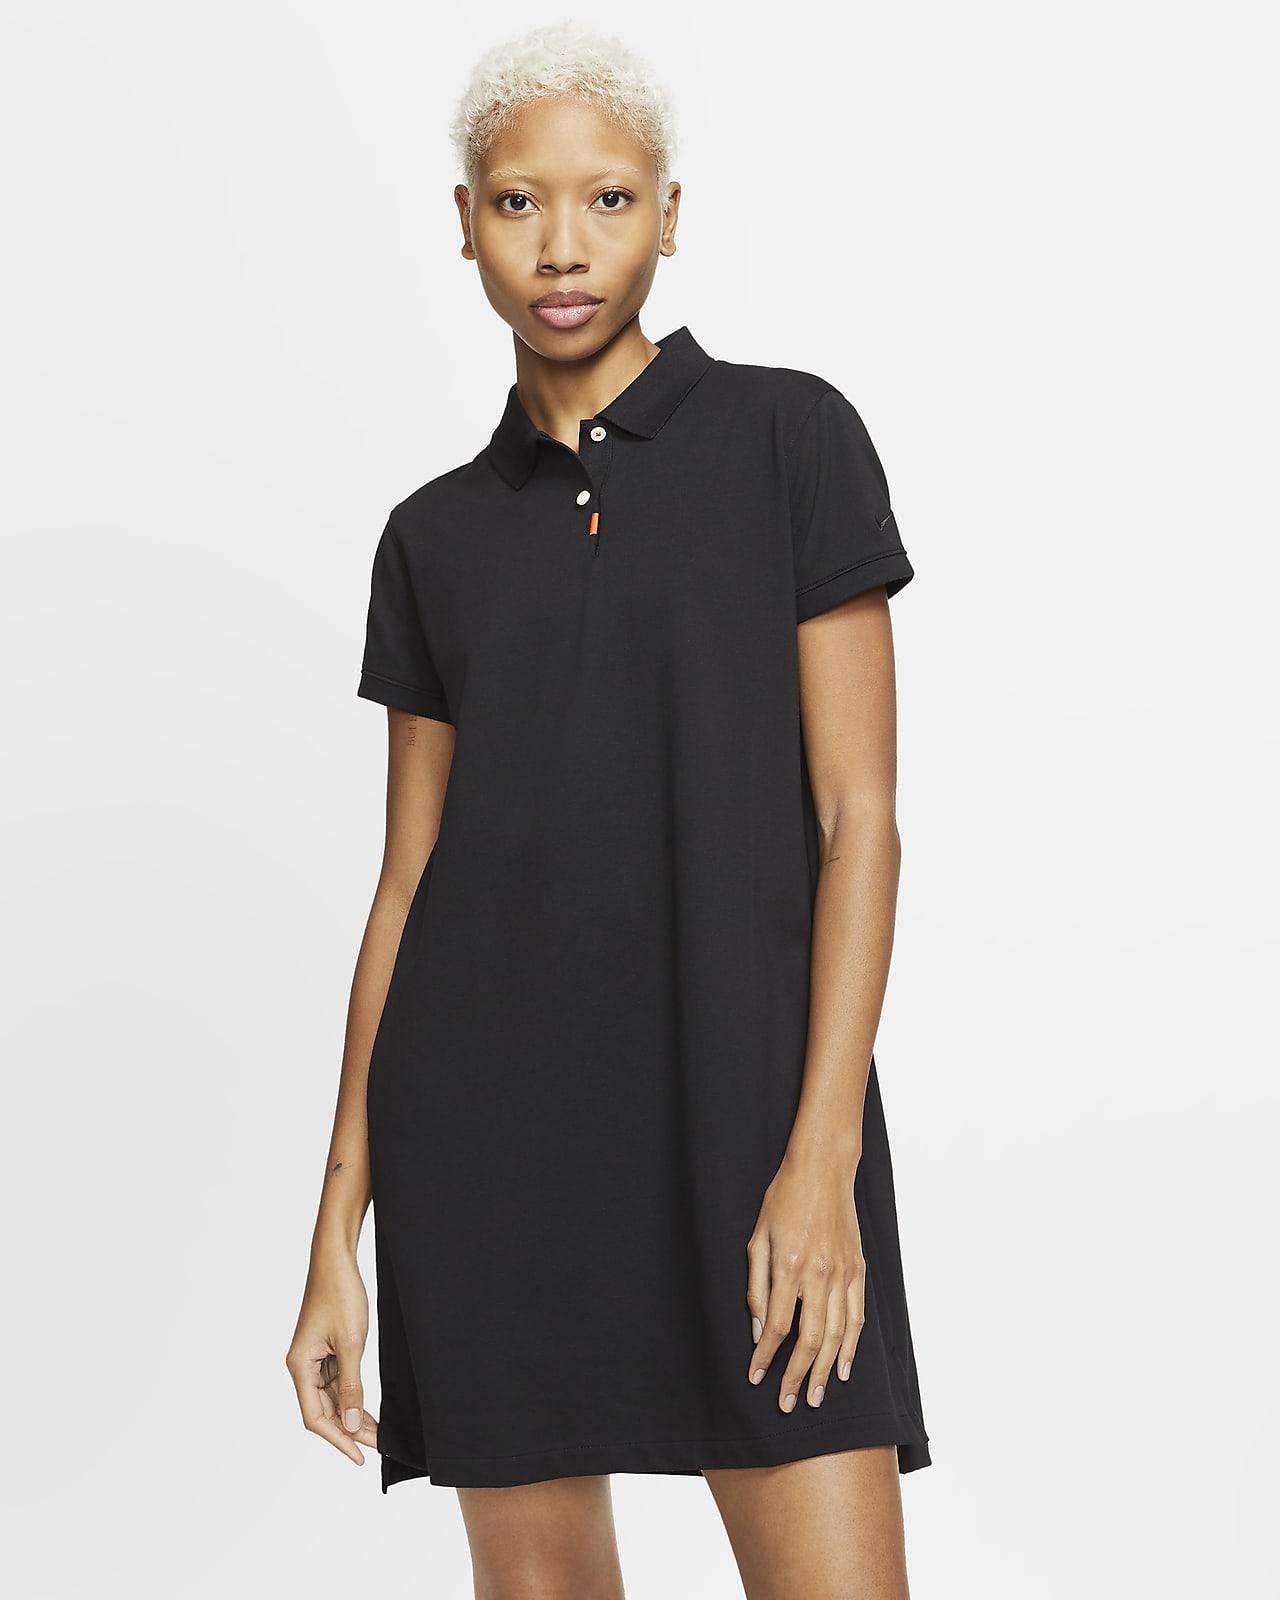 The Nike Polo Women's Dress. Nike JP